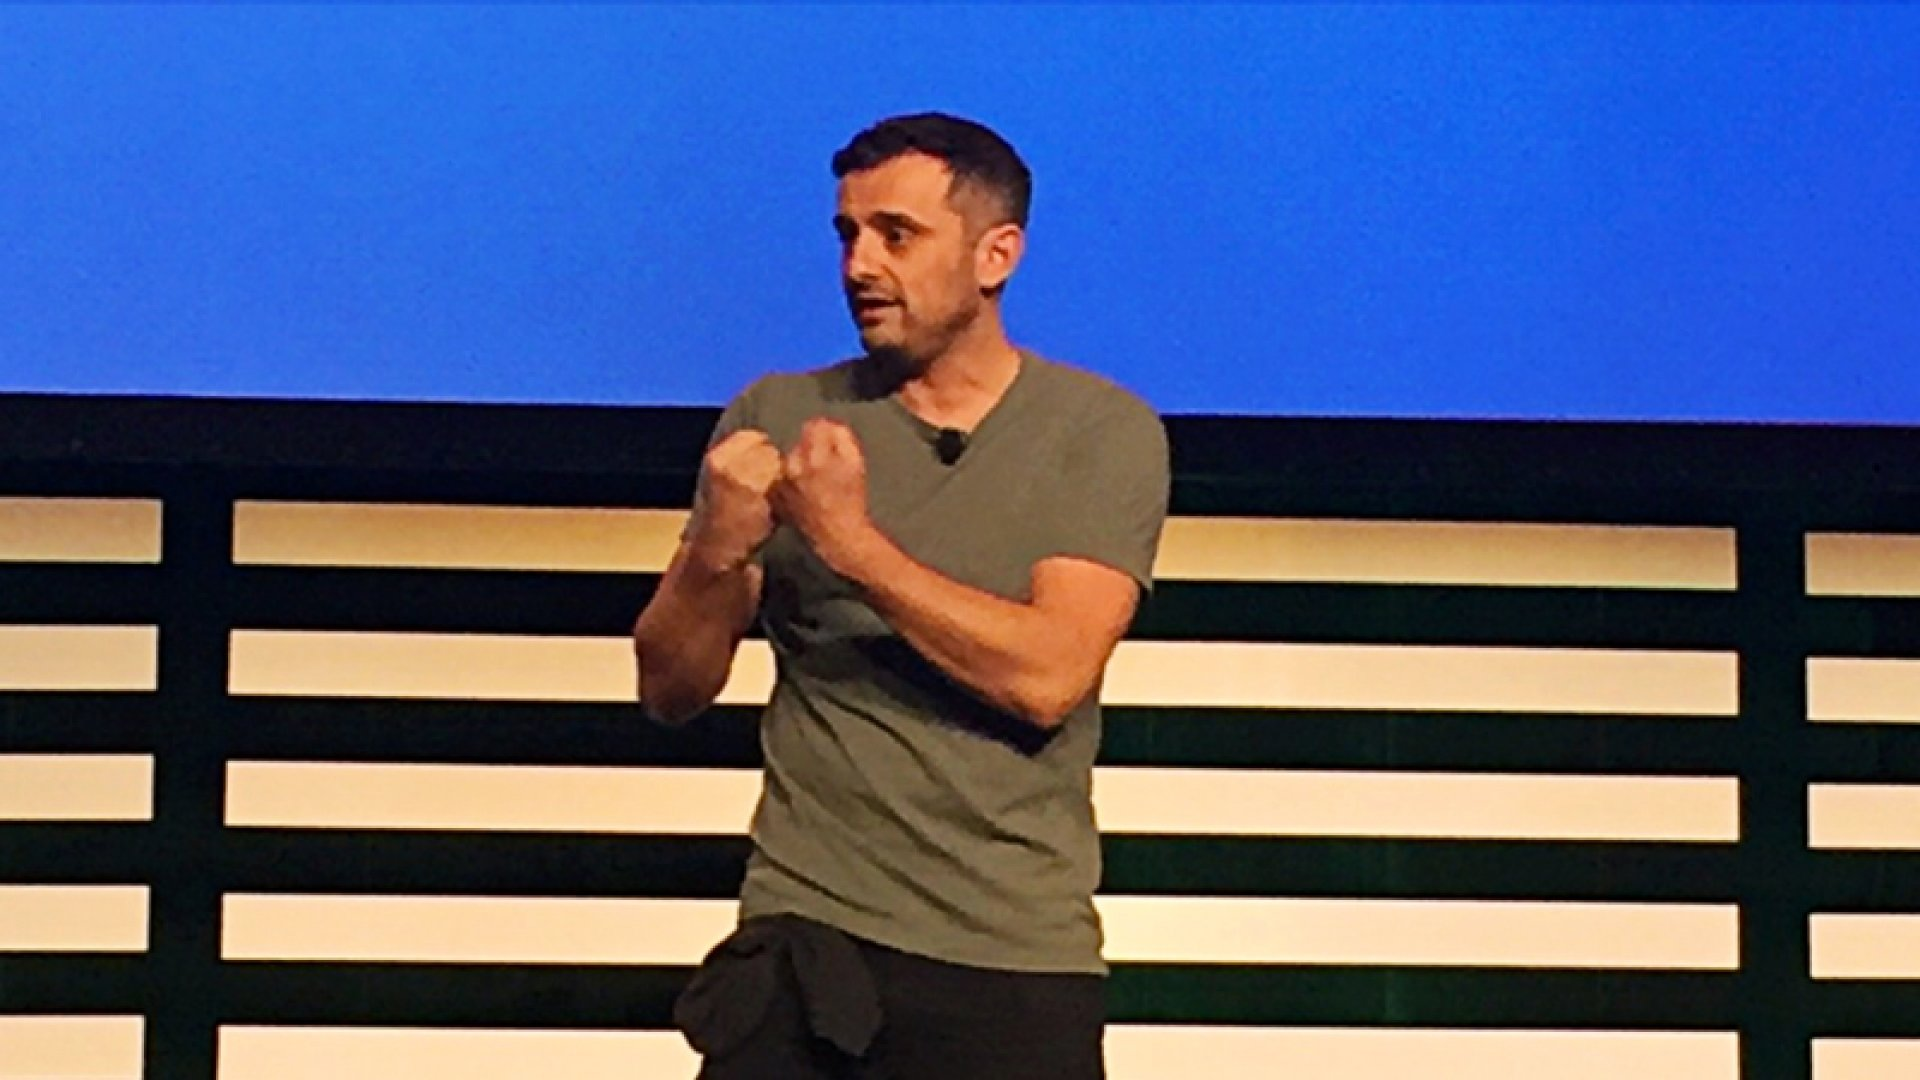 Gary Vaynerchuk captivating the audience.